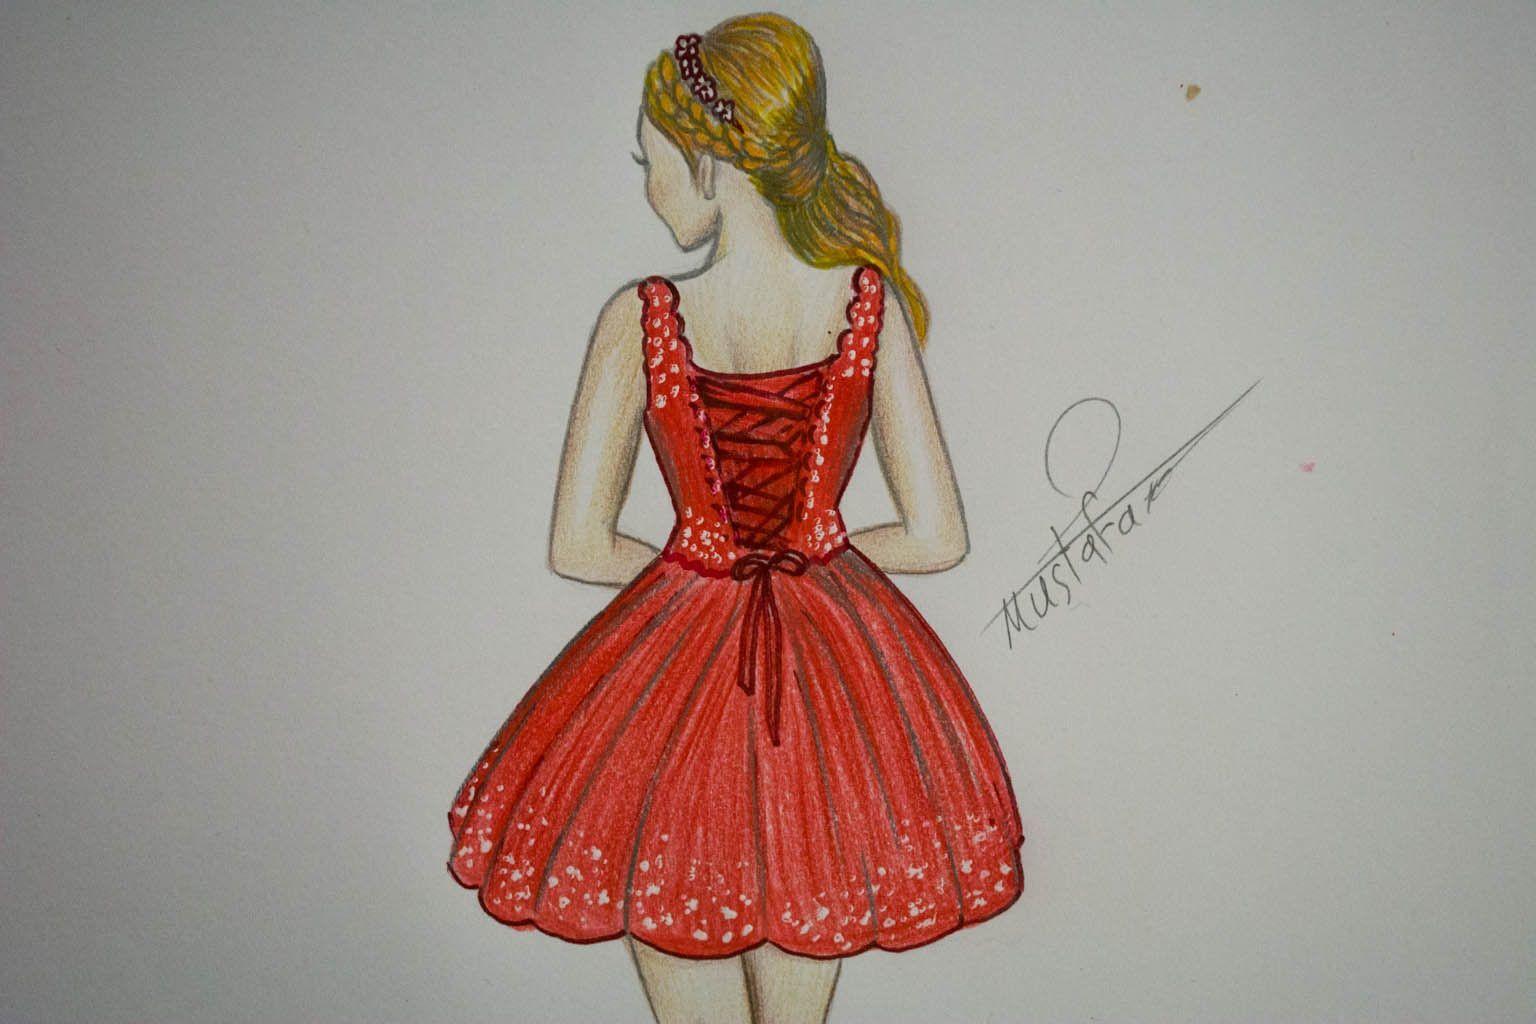 تعلم رسم جسم فتاة مع فستان قصير مميز How To Draw Girl With A Dress Fashion Sketches Girl Drawing Fashion